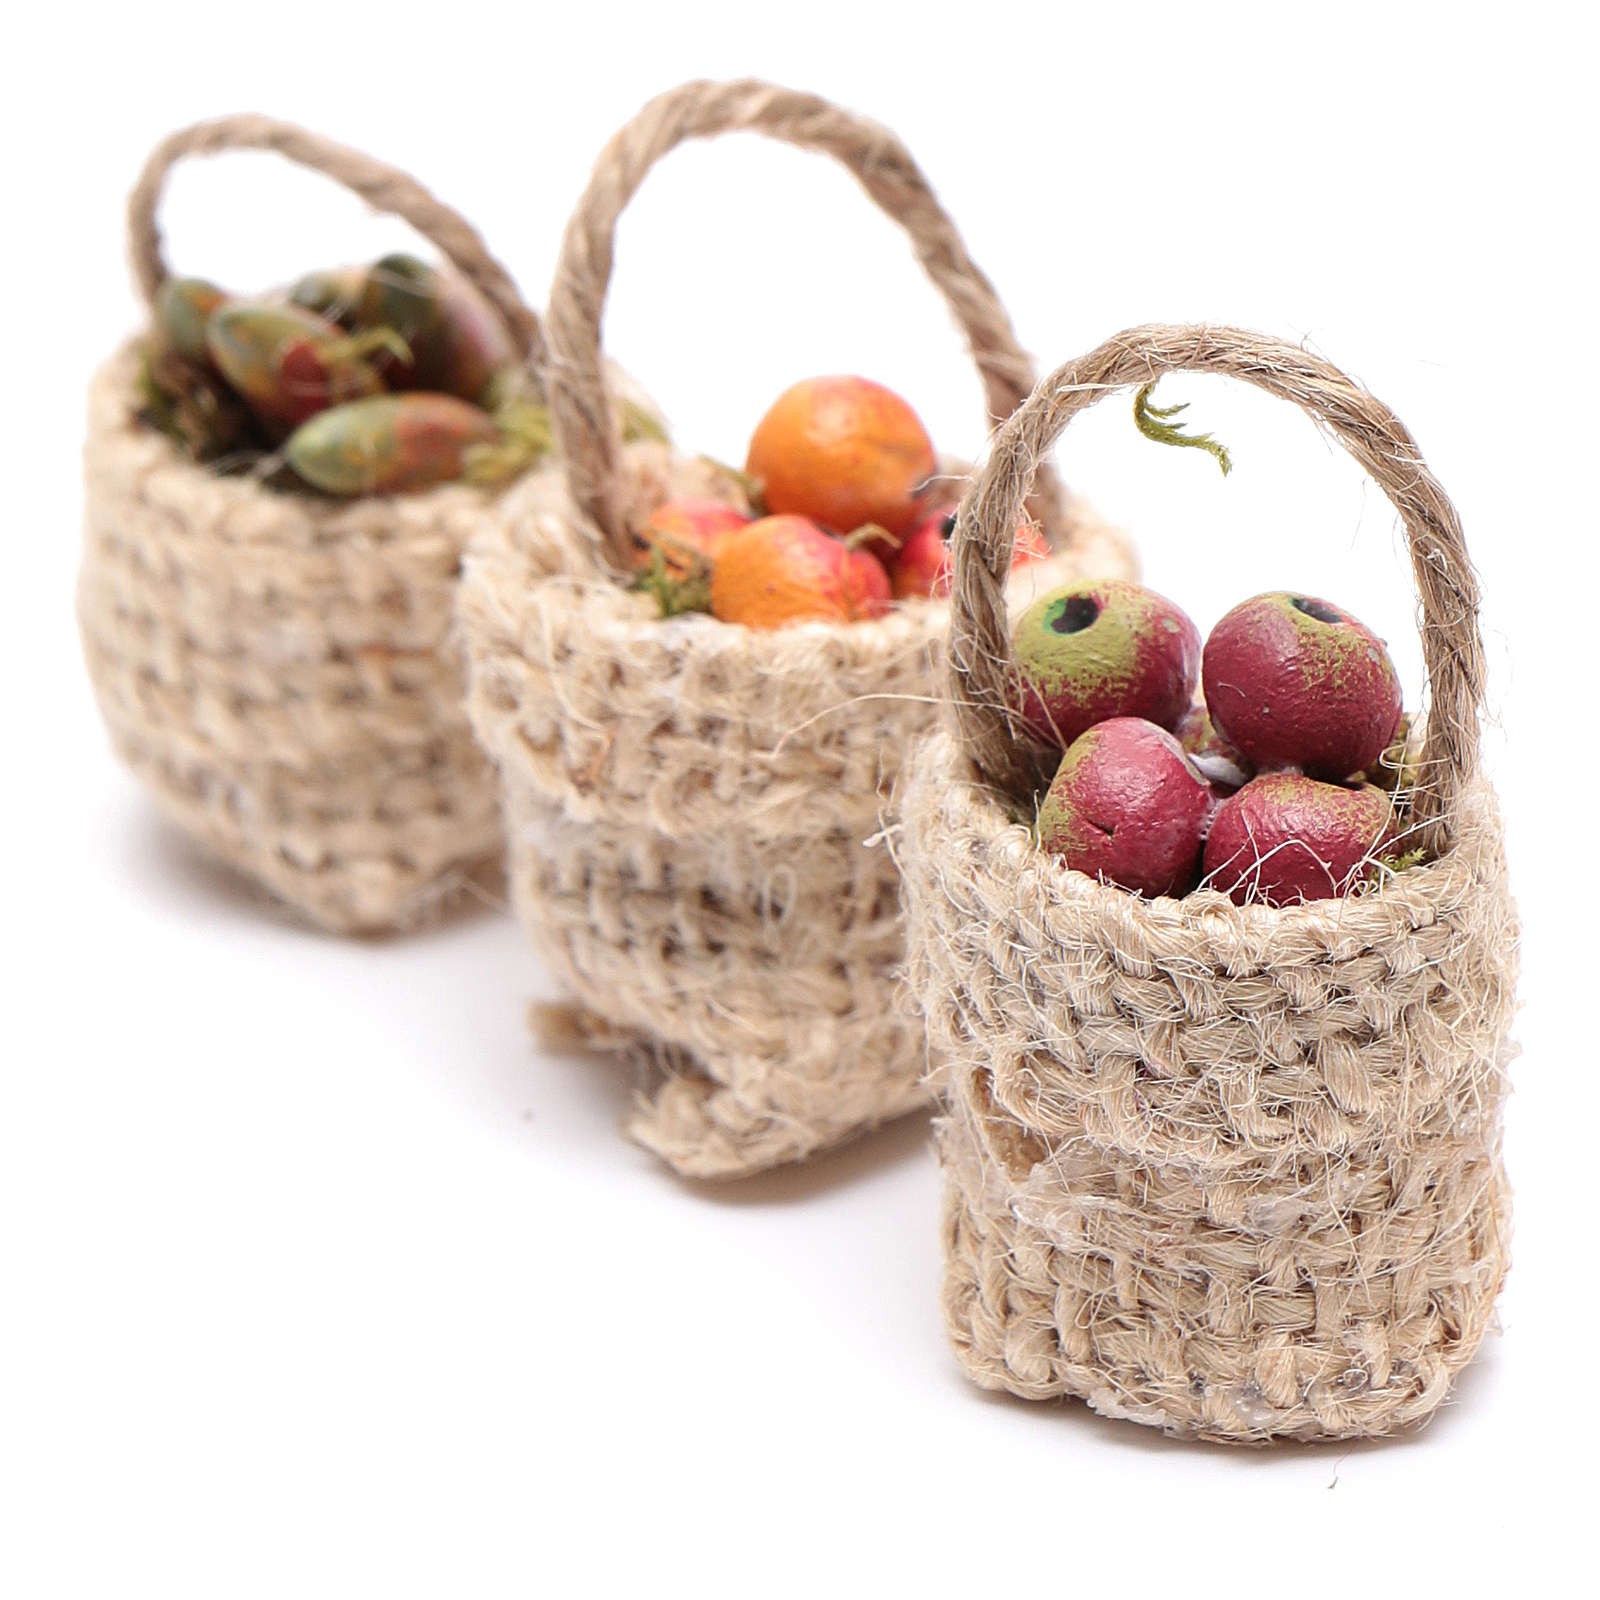 Cesti frutta 3pz. presepe 4